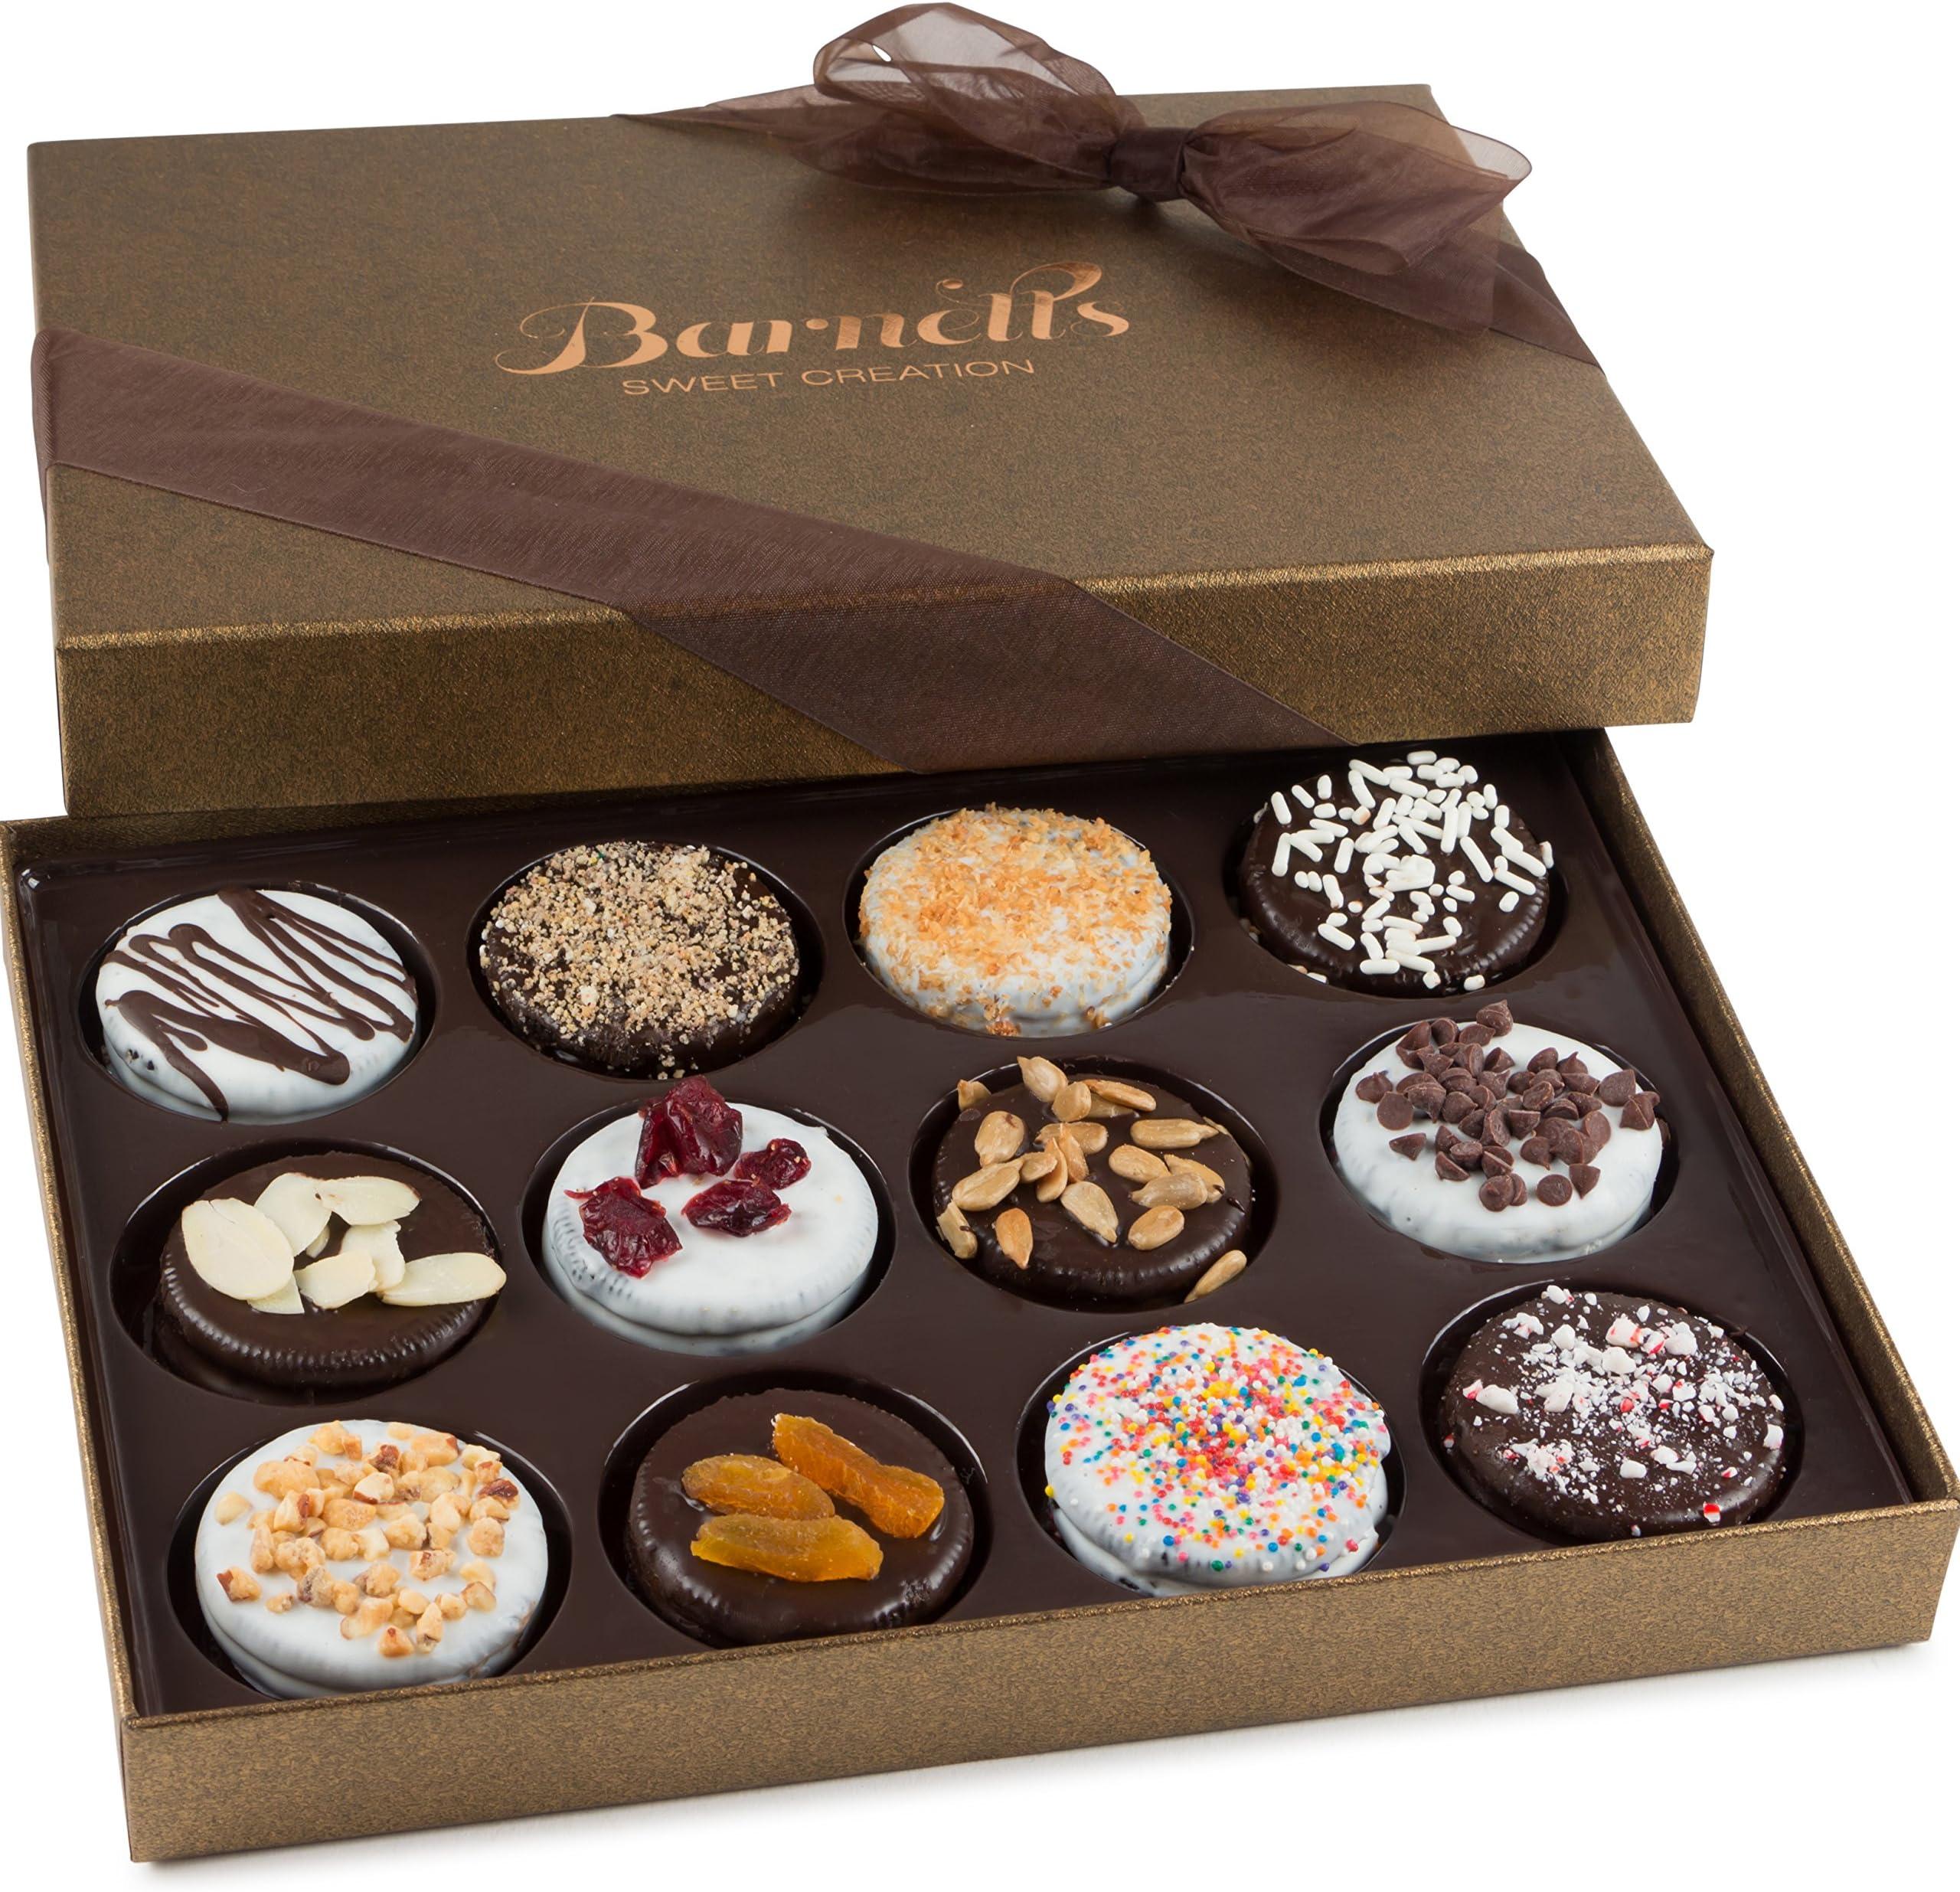 Barnettu0027s Chocolate Cookies Gift Basket Gourmet Christmas Holiday Corporate Food Gifts in Elegant Box  sc 1 st  Amazon.com & Amazon.com: Food u0026 Beverage Gifts: Grocery u0026 Gourmet Food: Candy ...